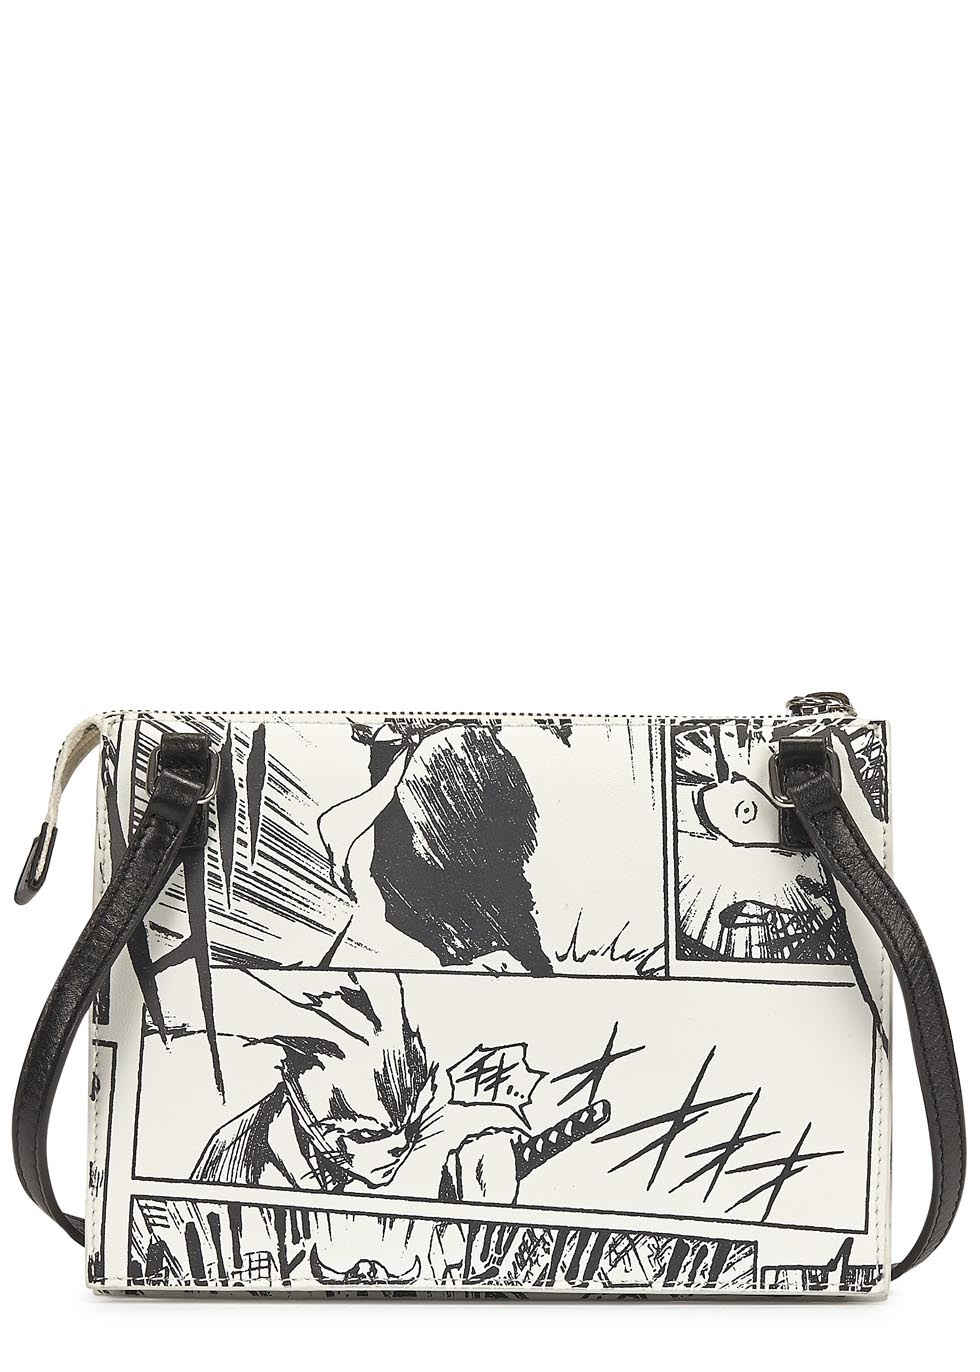 McQ Monochrome Manga Print Cross-Body Bag in Black